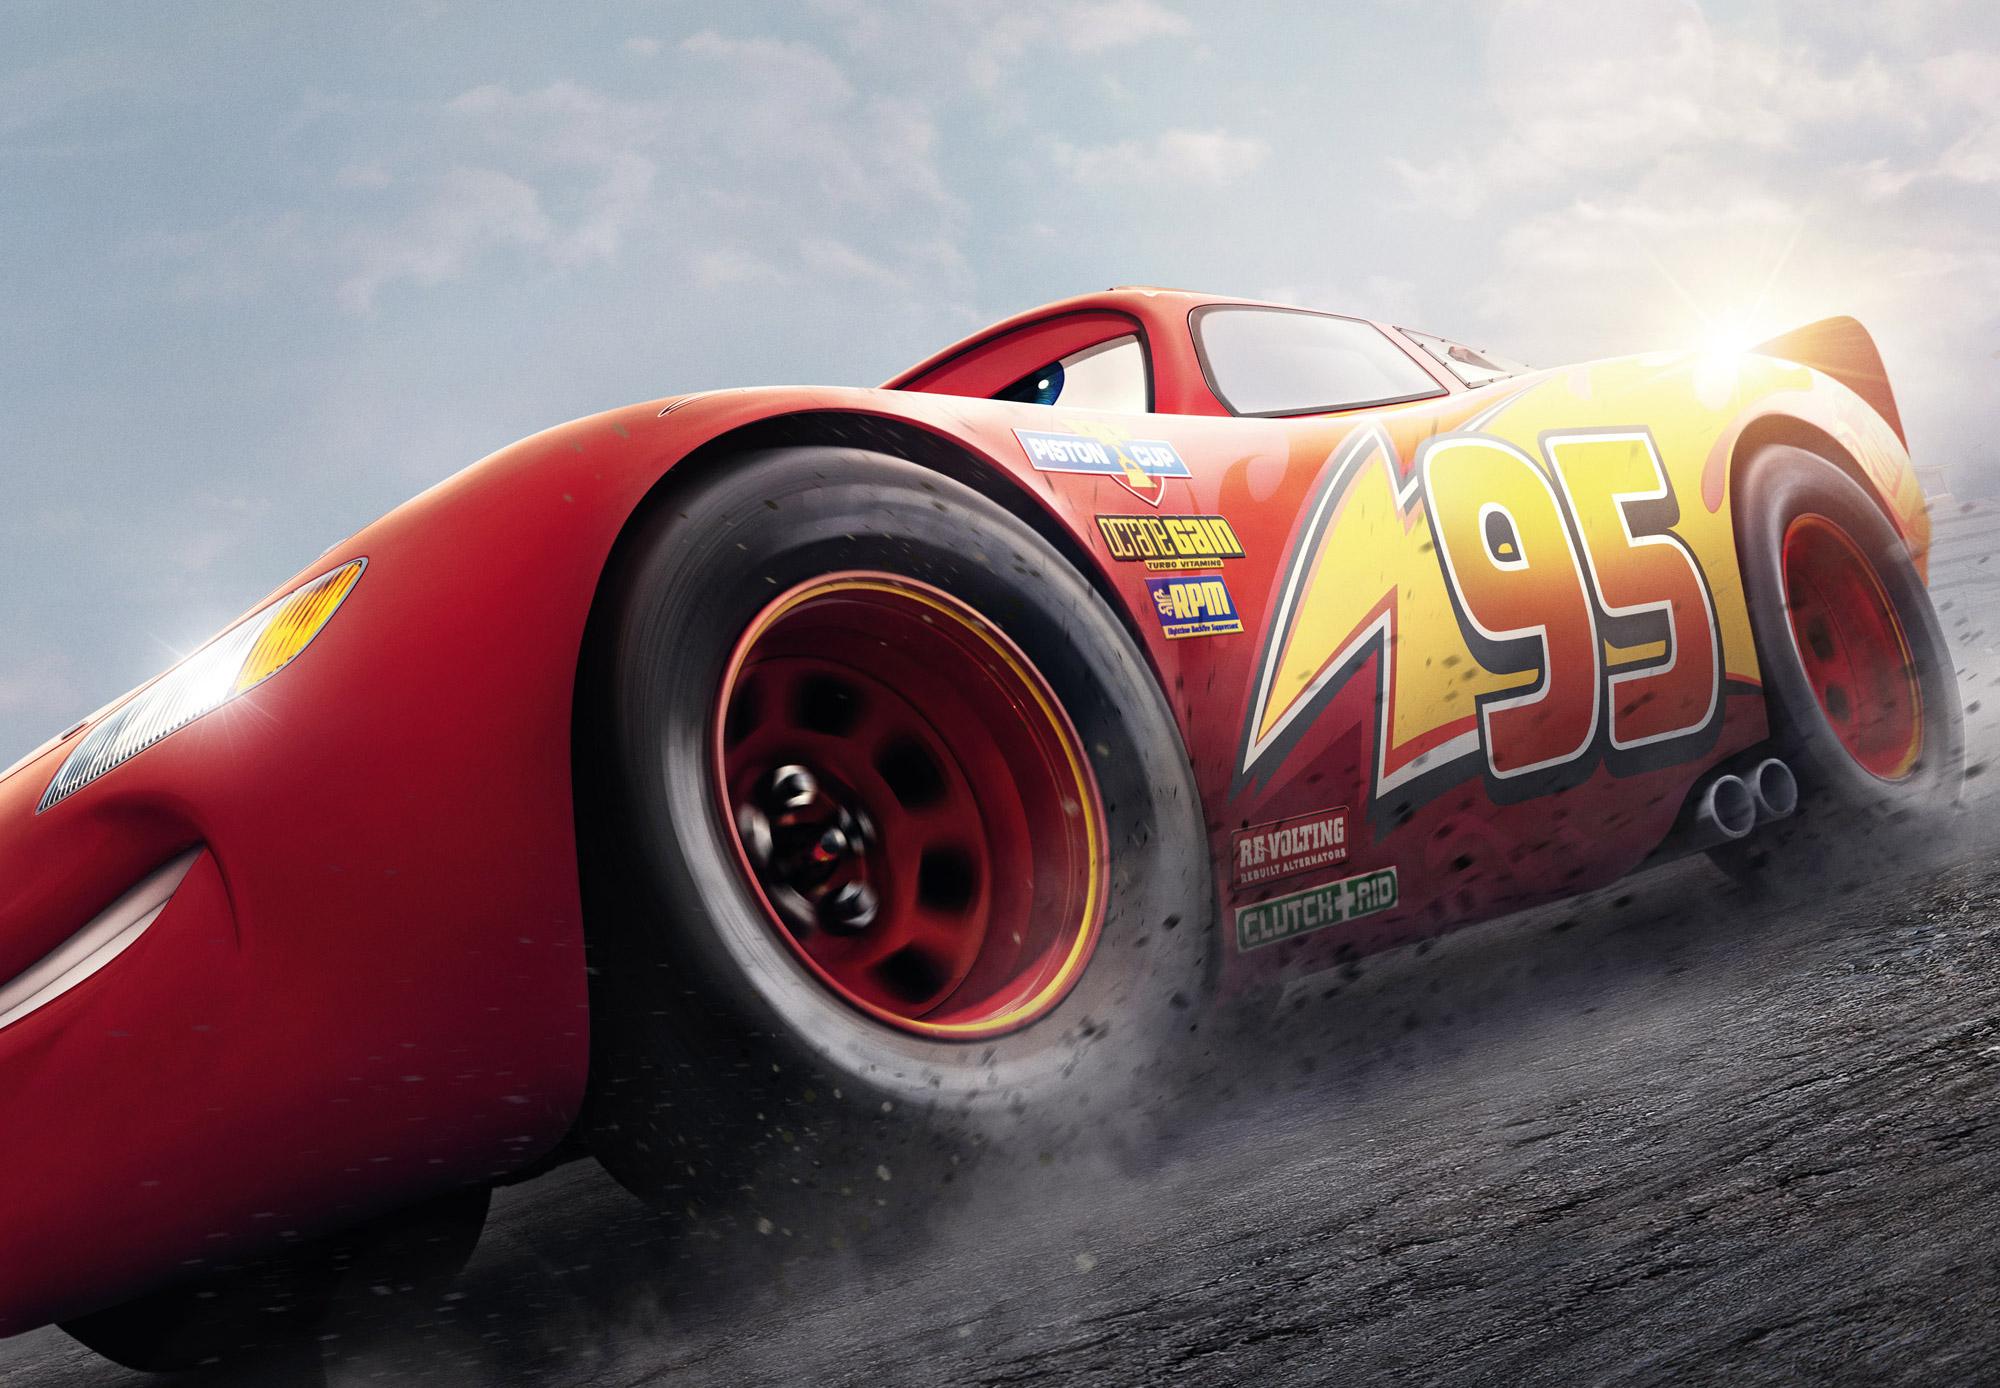 Disney Pixar Cars World Wallpaper Mural Lightning Mcqueen Cars 3 Hd Hd Movies 4k Wallpapers